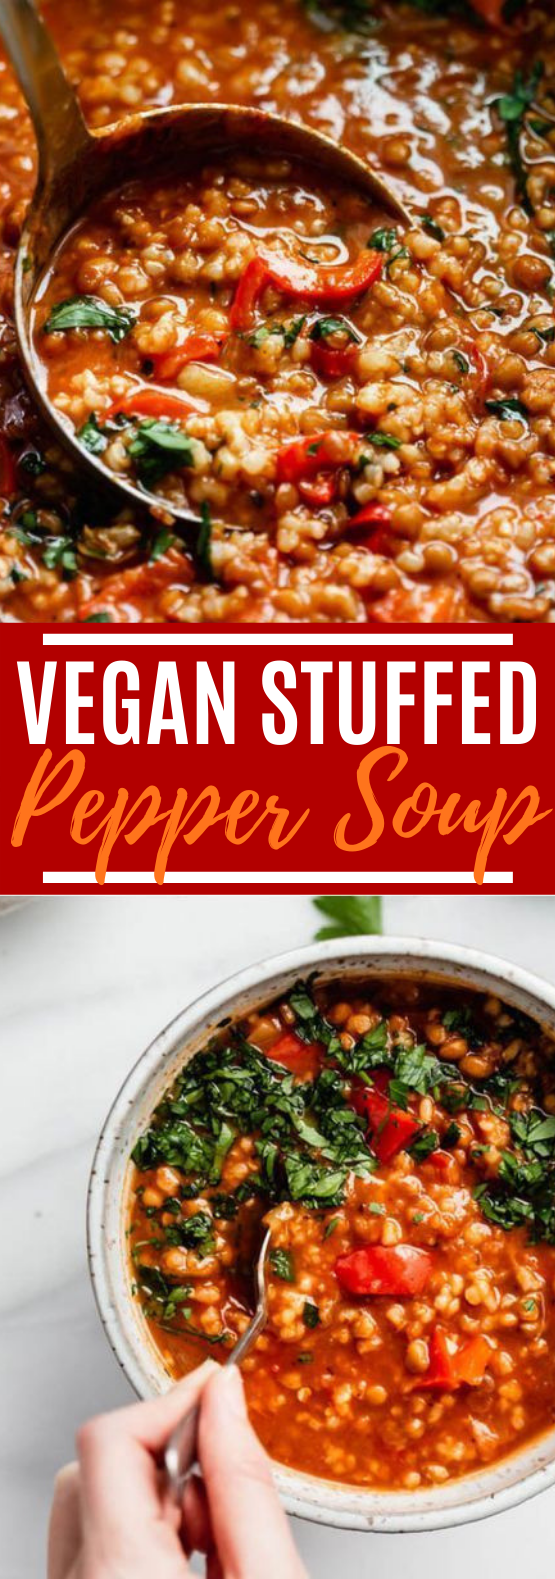 Vegan Stuffed Pepper Soup #vegan #dinner #soup #comfortfood #meatless